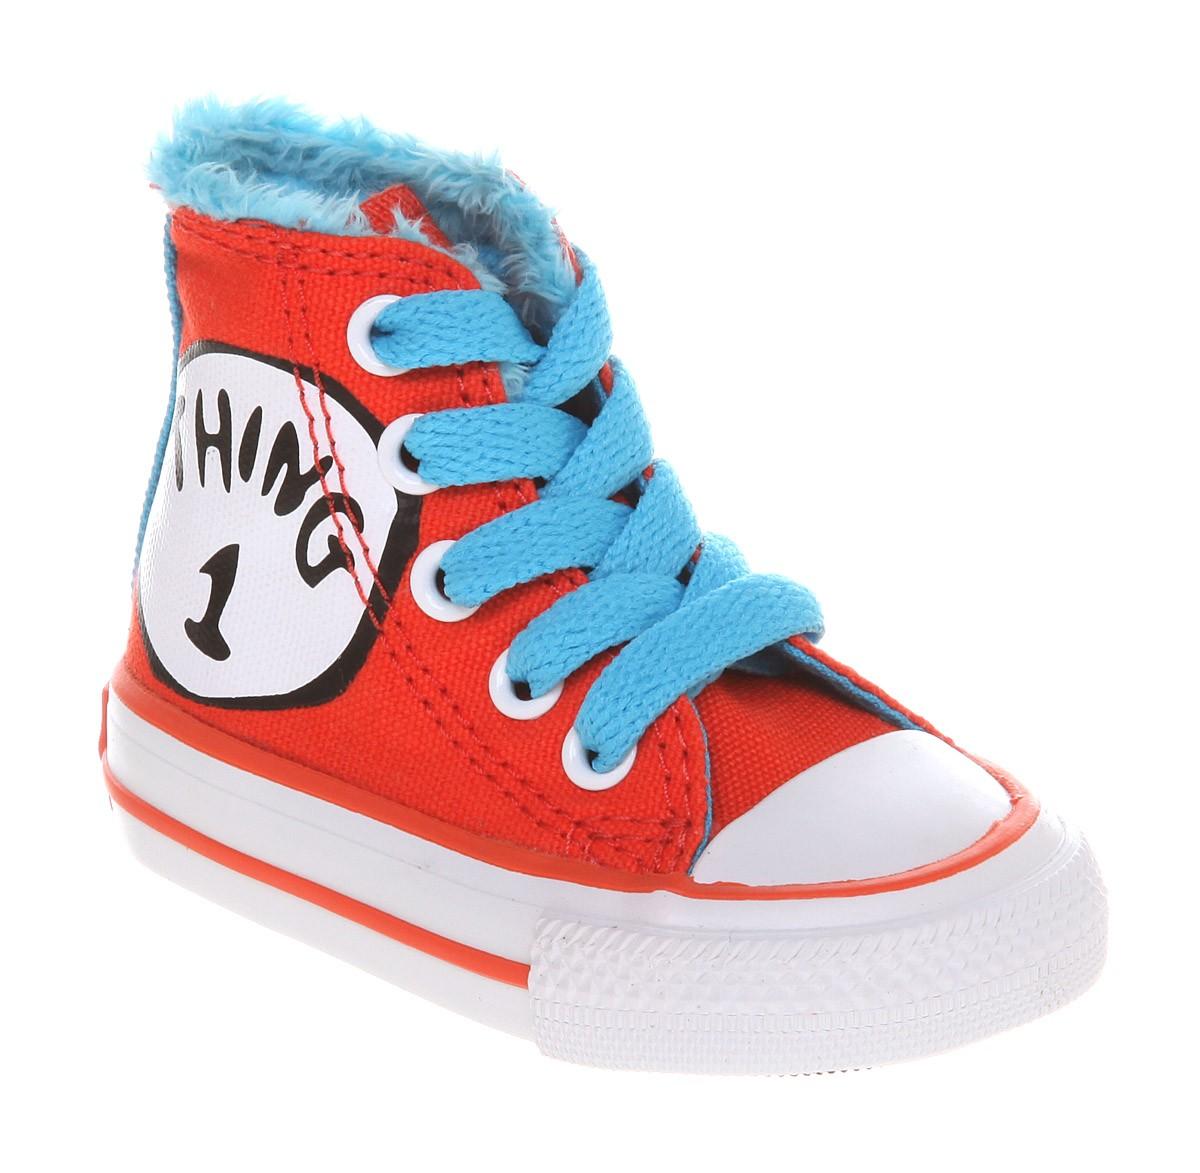 Introducing Dr.Seuss shoes! - MadeForMums ef1940328